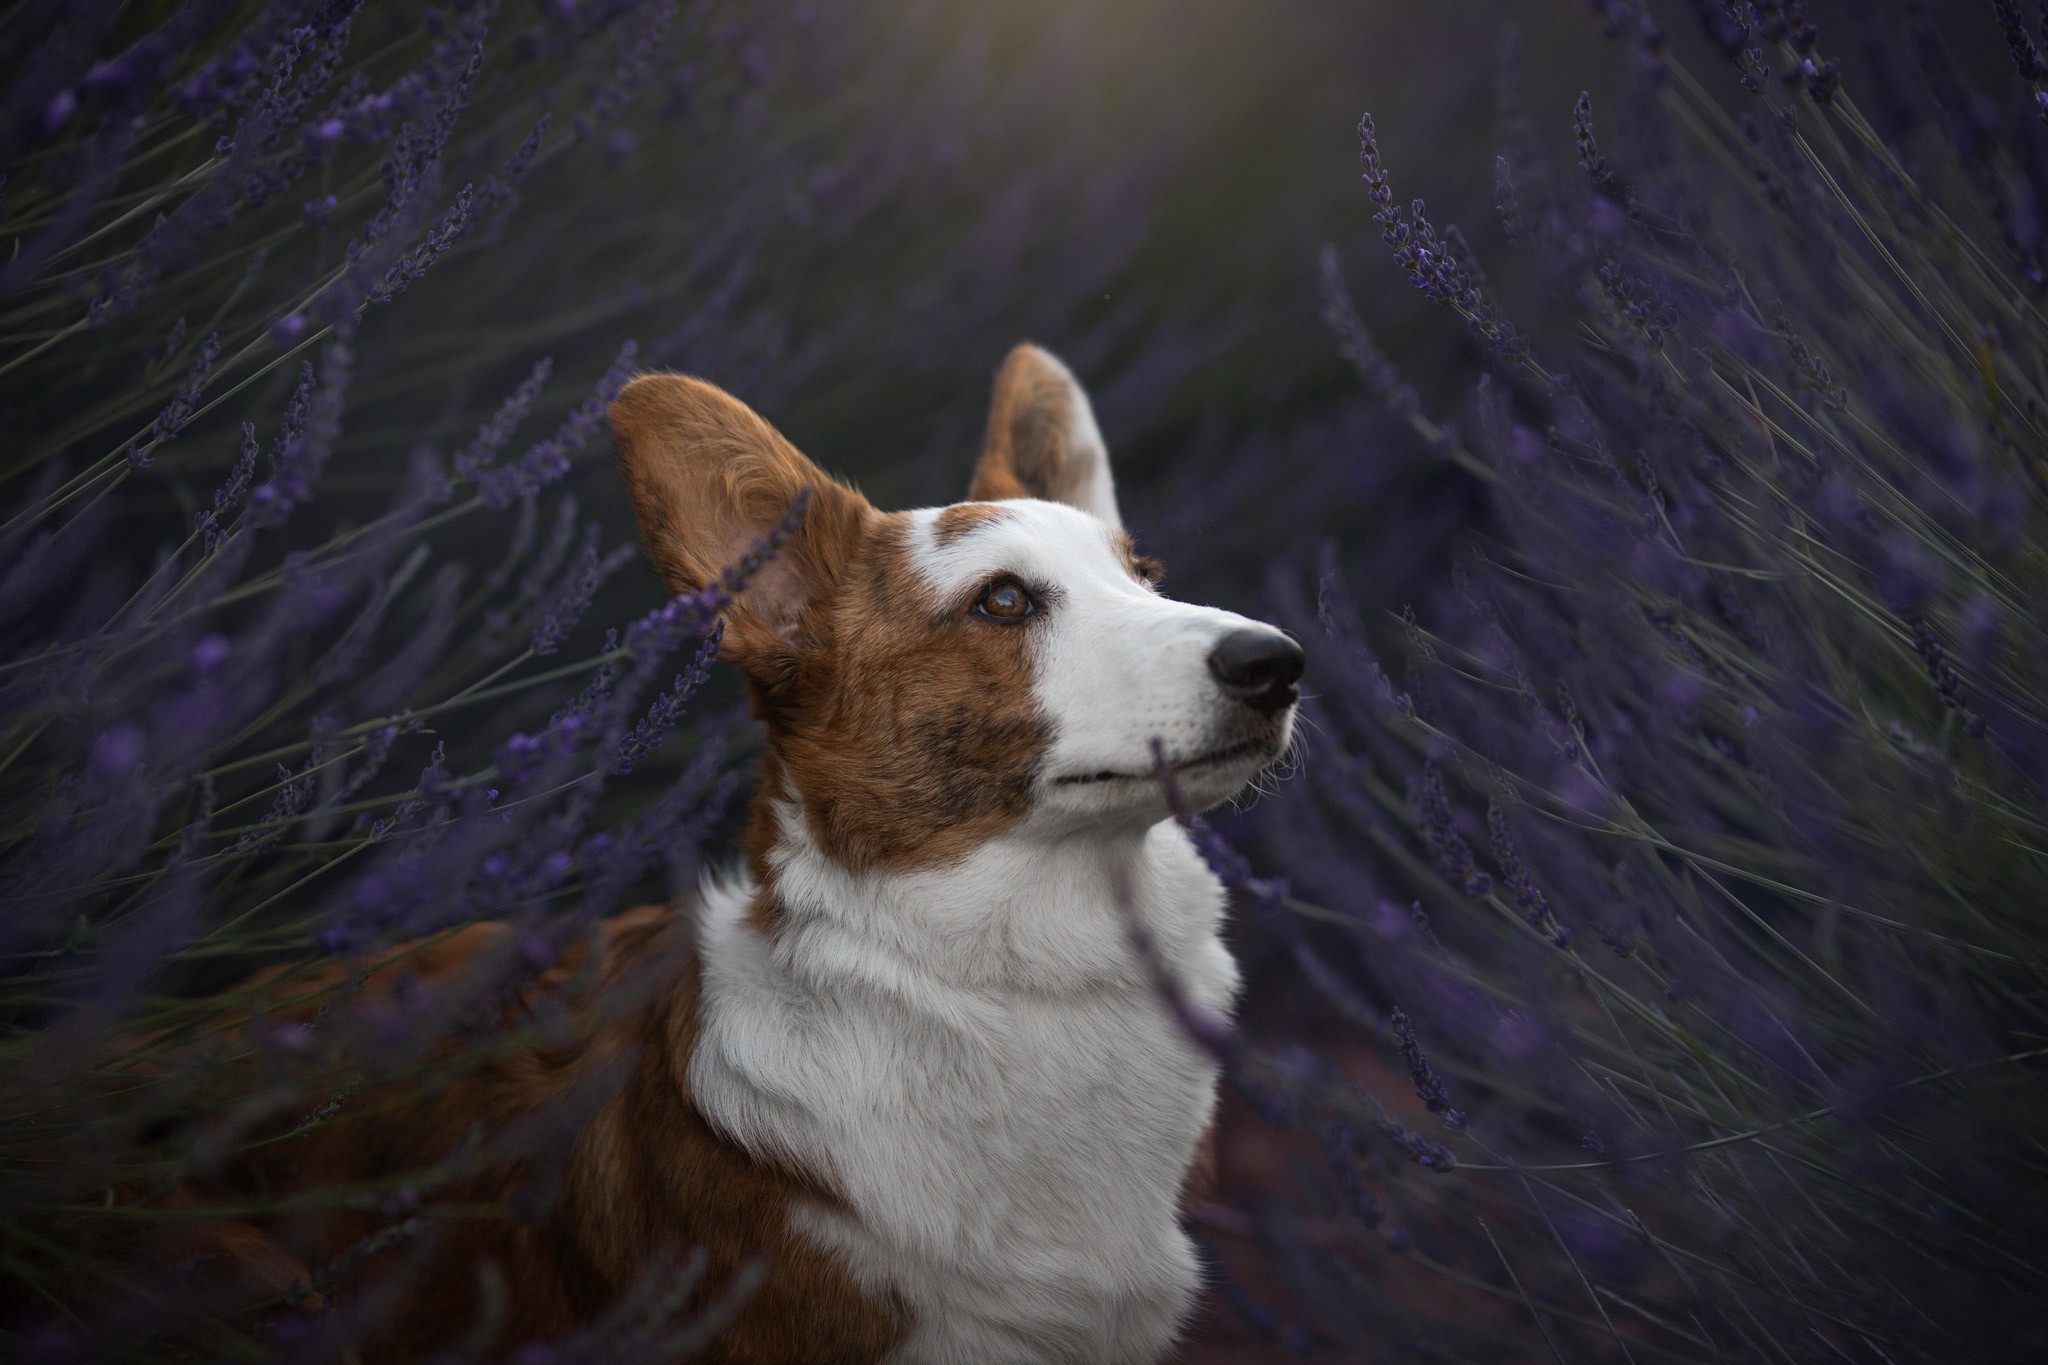 photographe canine alpes haute provence - séance photo canine